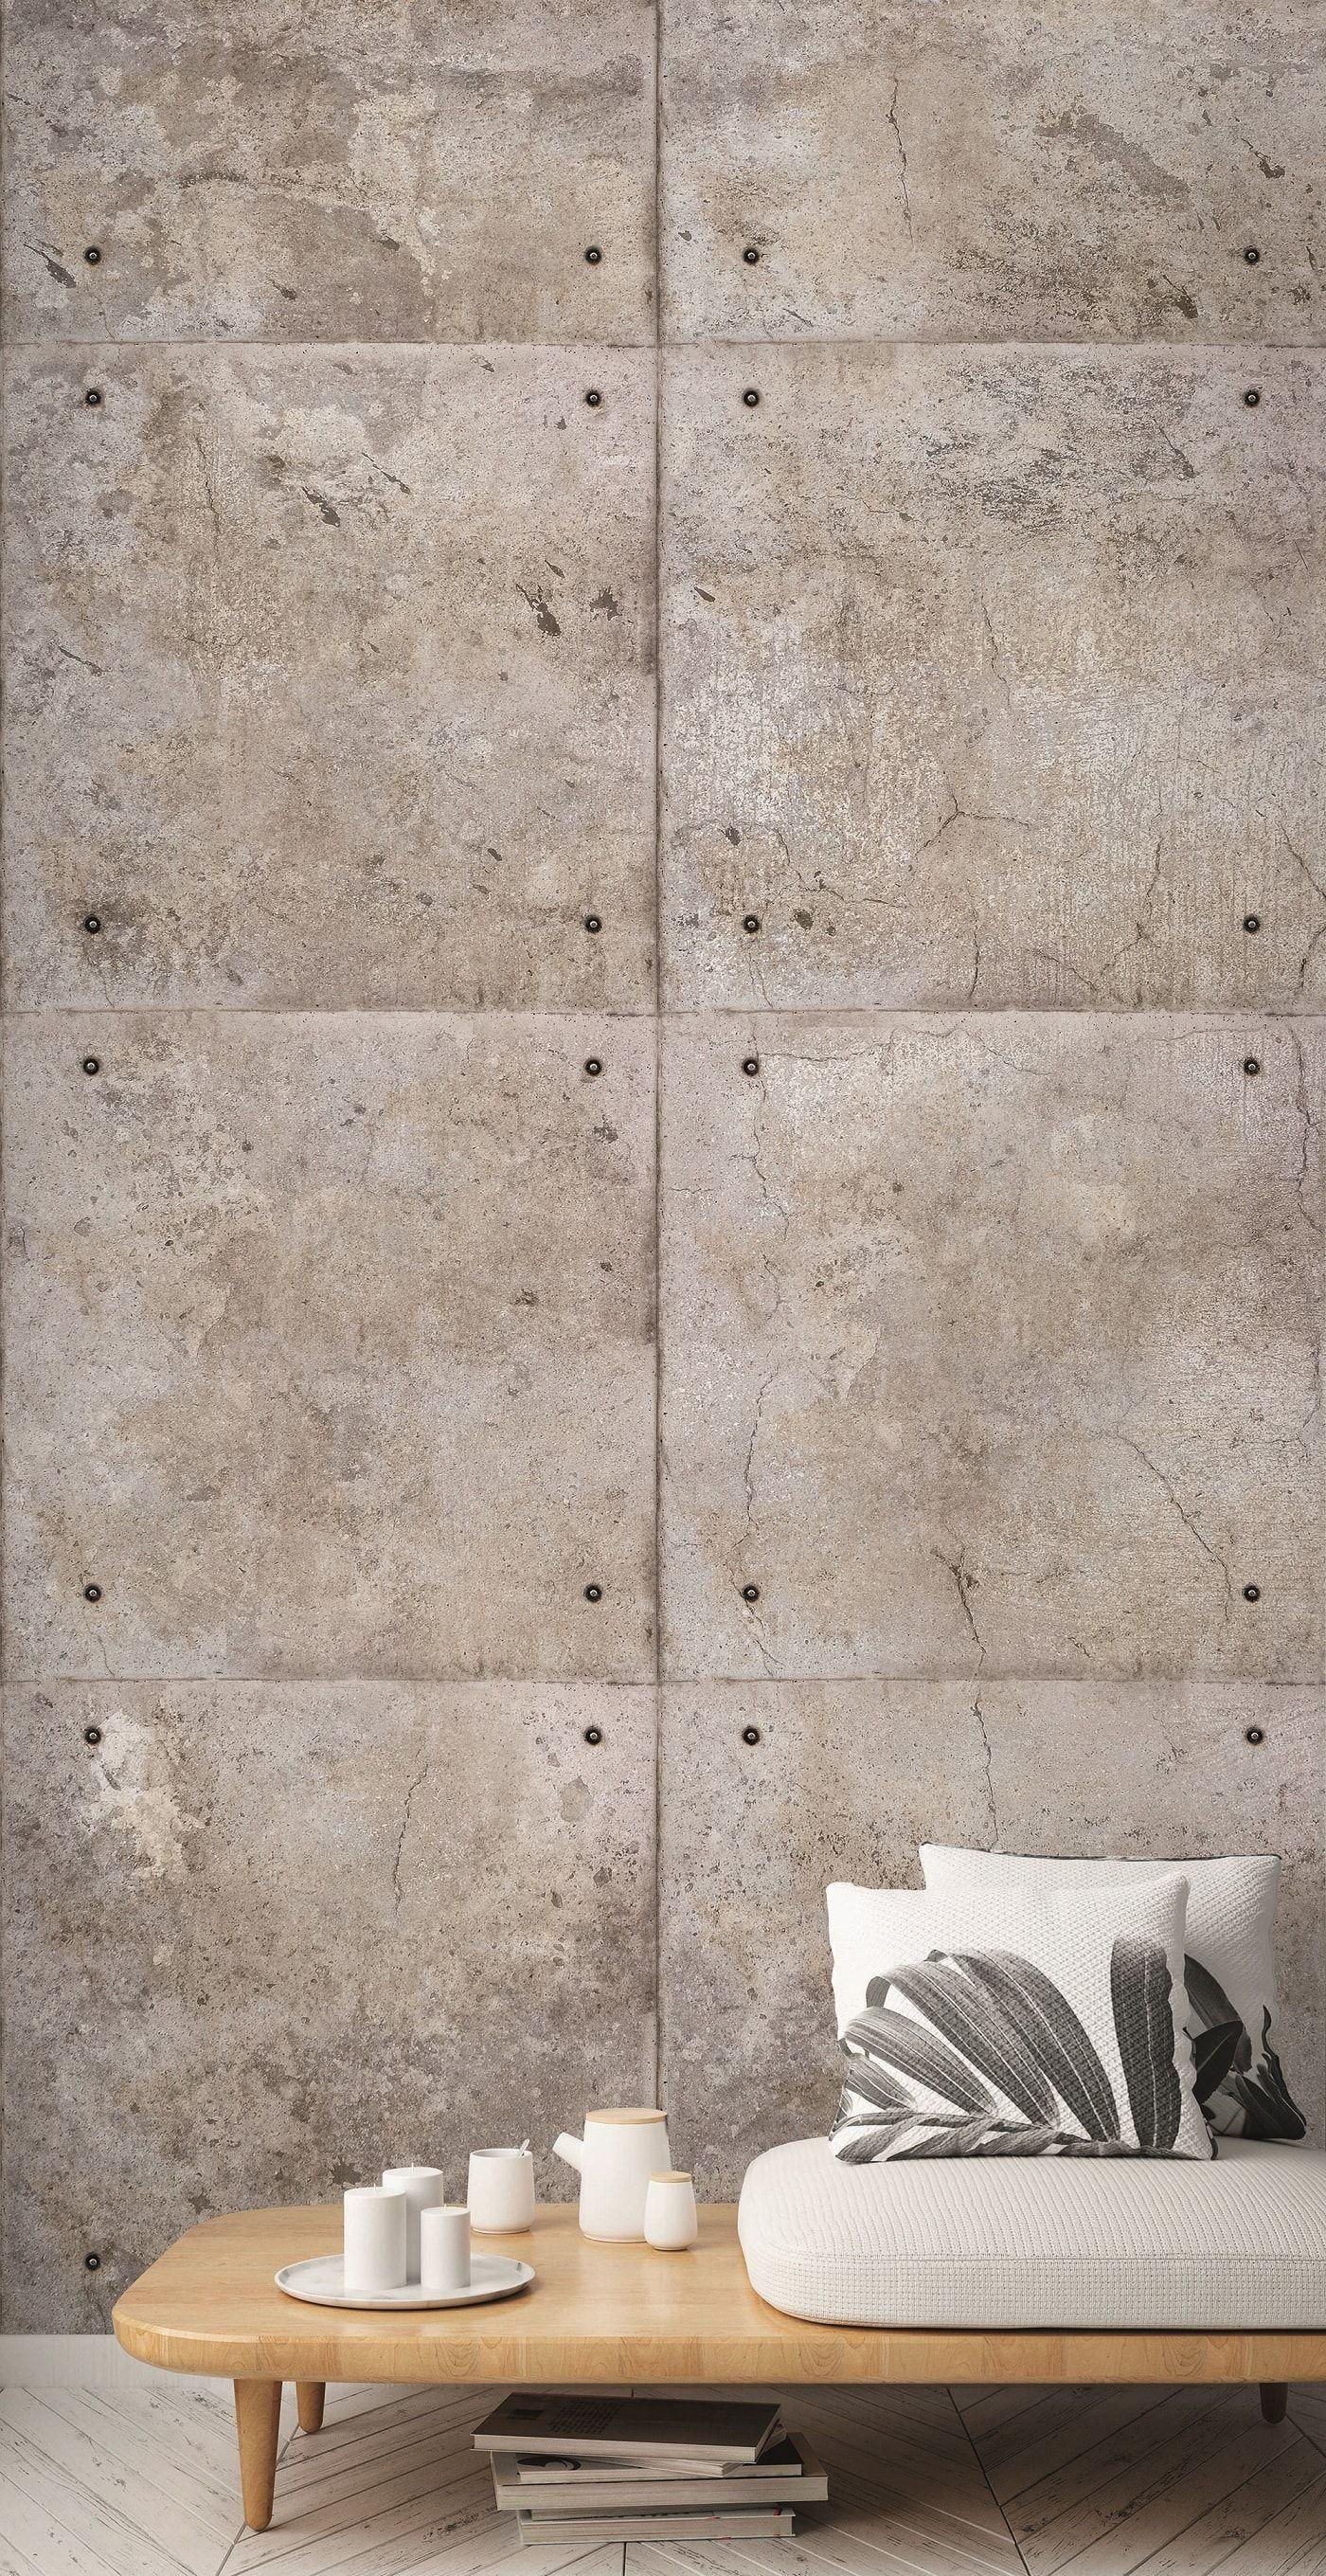 Vlies Fototapete 3d Beton Blocke Wand Grau Wandbild 1 59mx2 80m Steinwandfliesen Fototapete Tapeten